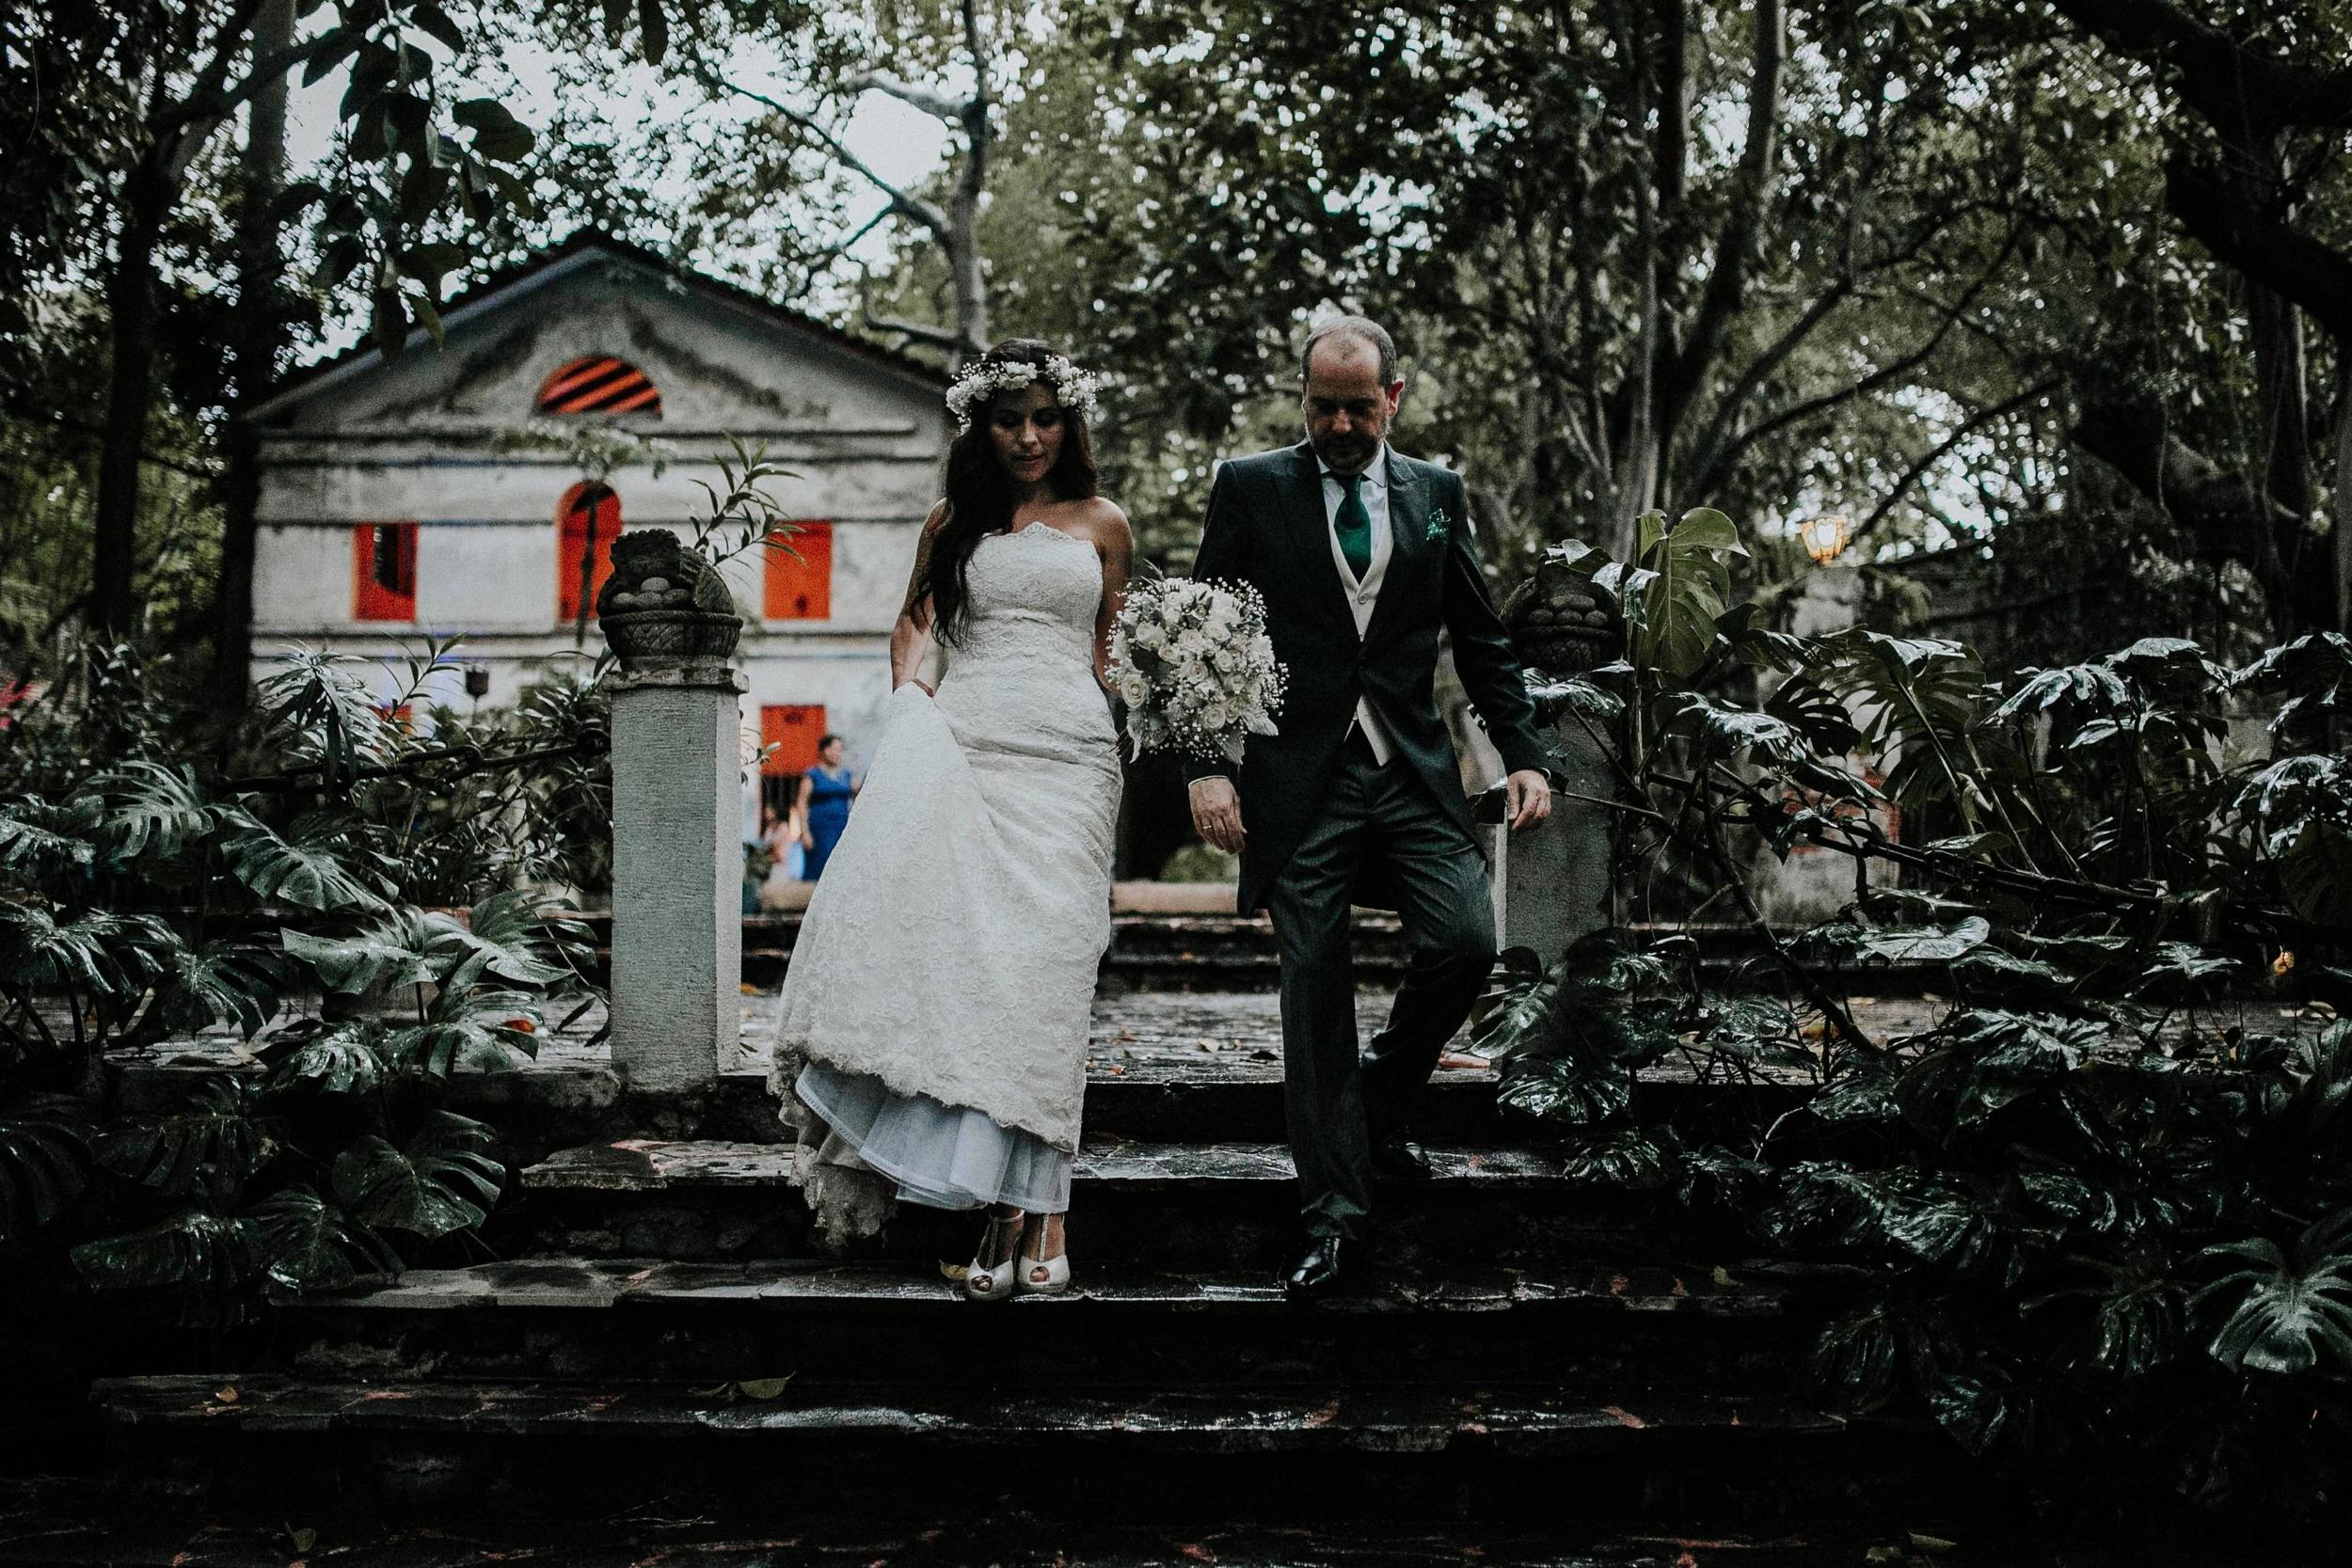 643A2332-Editaralfonso_flores_destination_wedding_photographer_San_gabriel_de_las_palmas.jpg